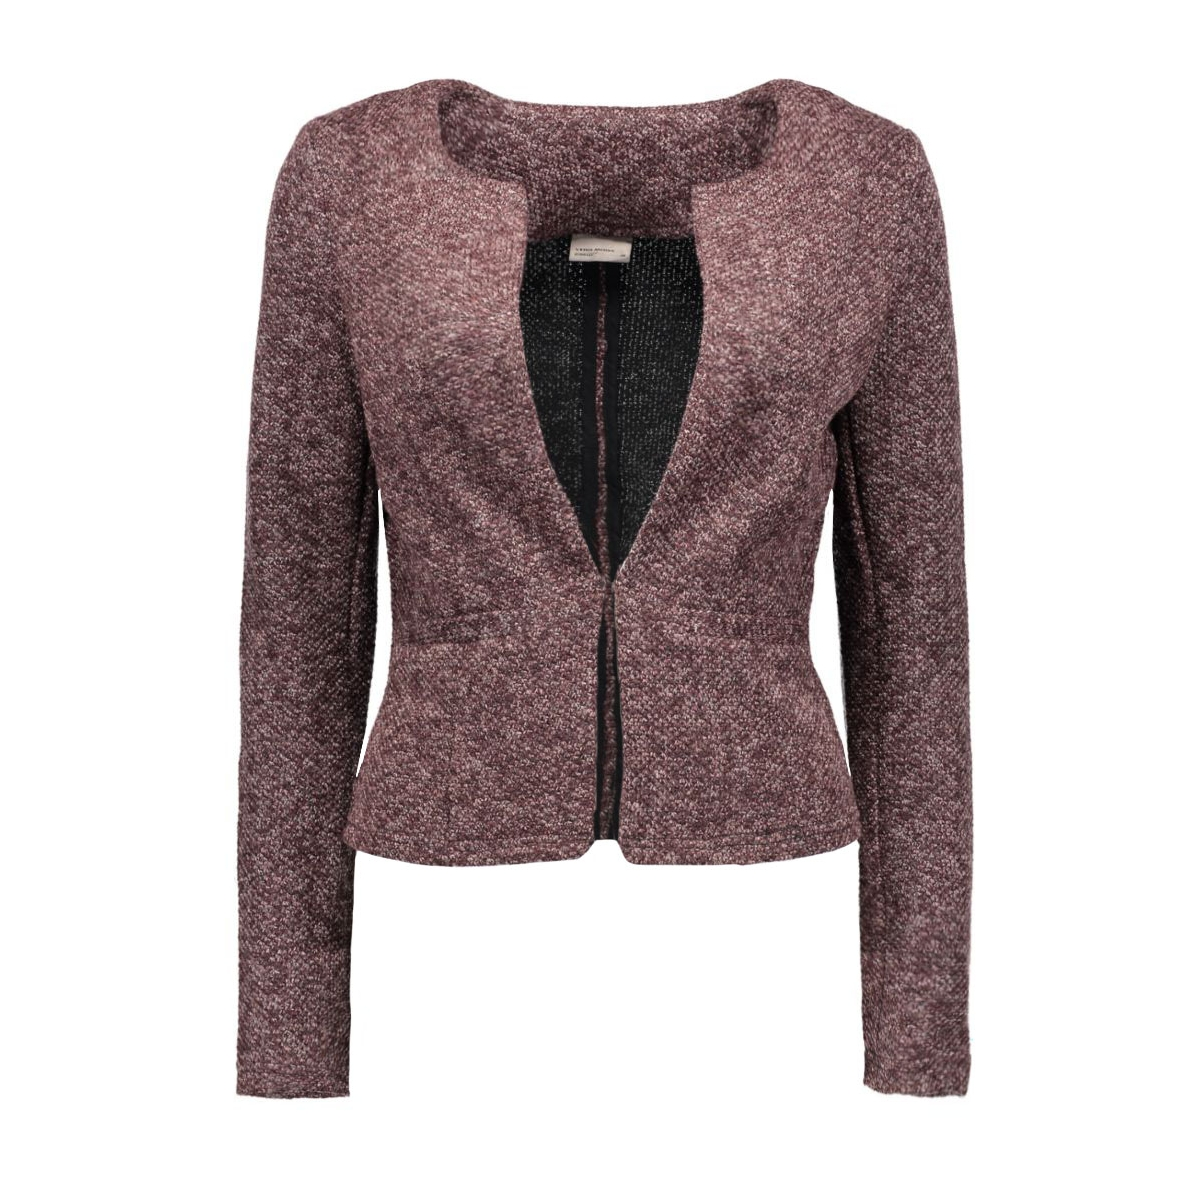 vmstructure l/s blazer a 10160277 vero moda blazer decadent chohol/melange